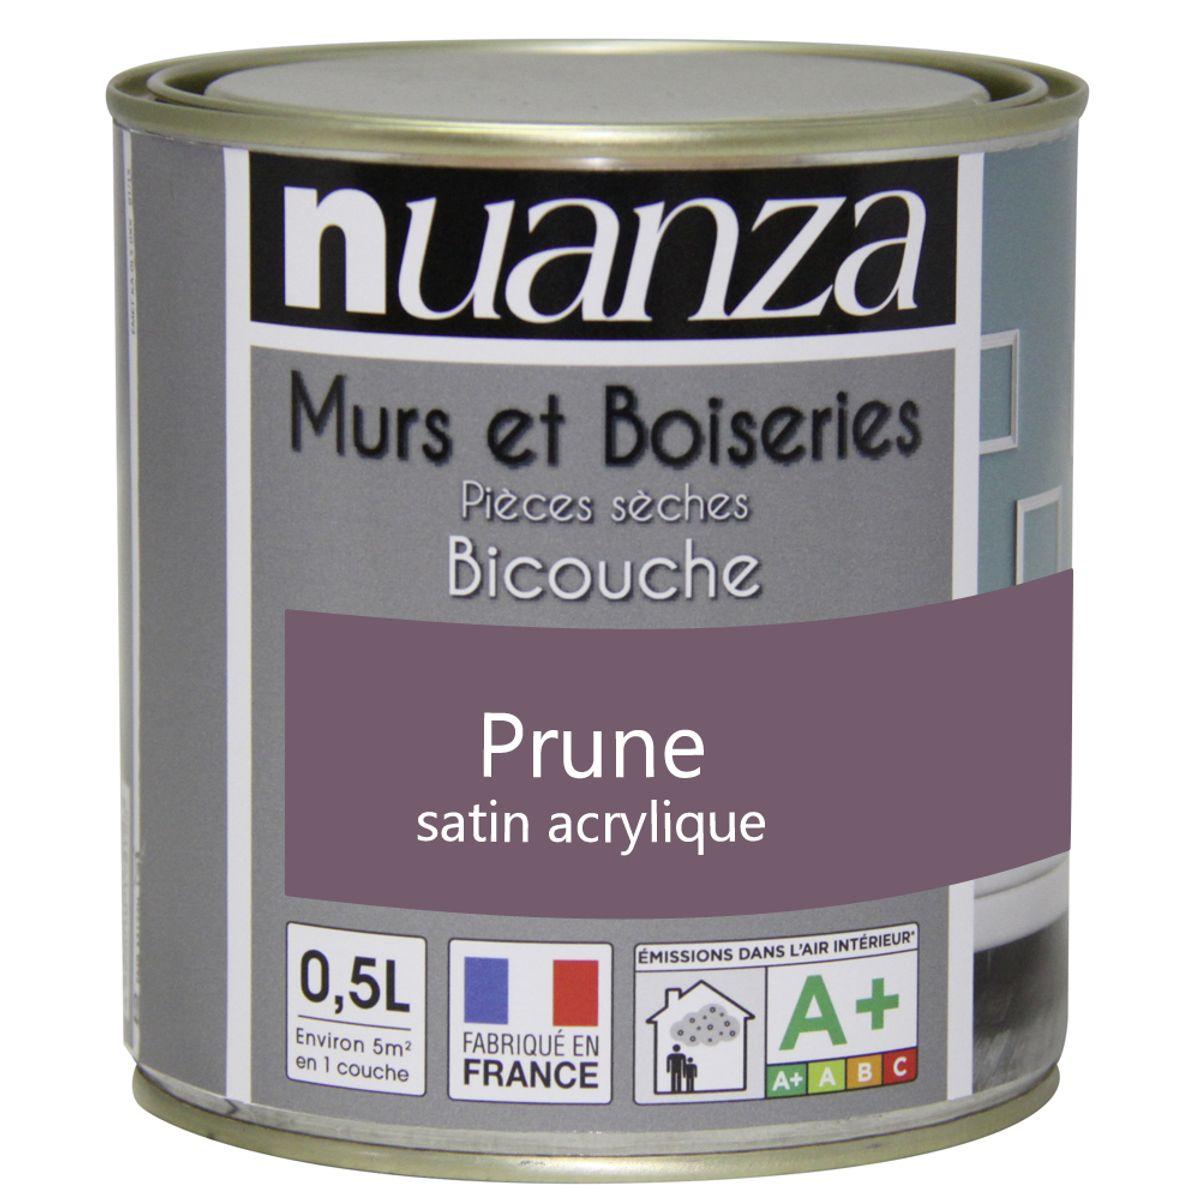 Peinture prune satin murs et boiseries Nuanza 0.5l